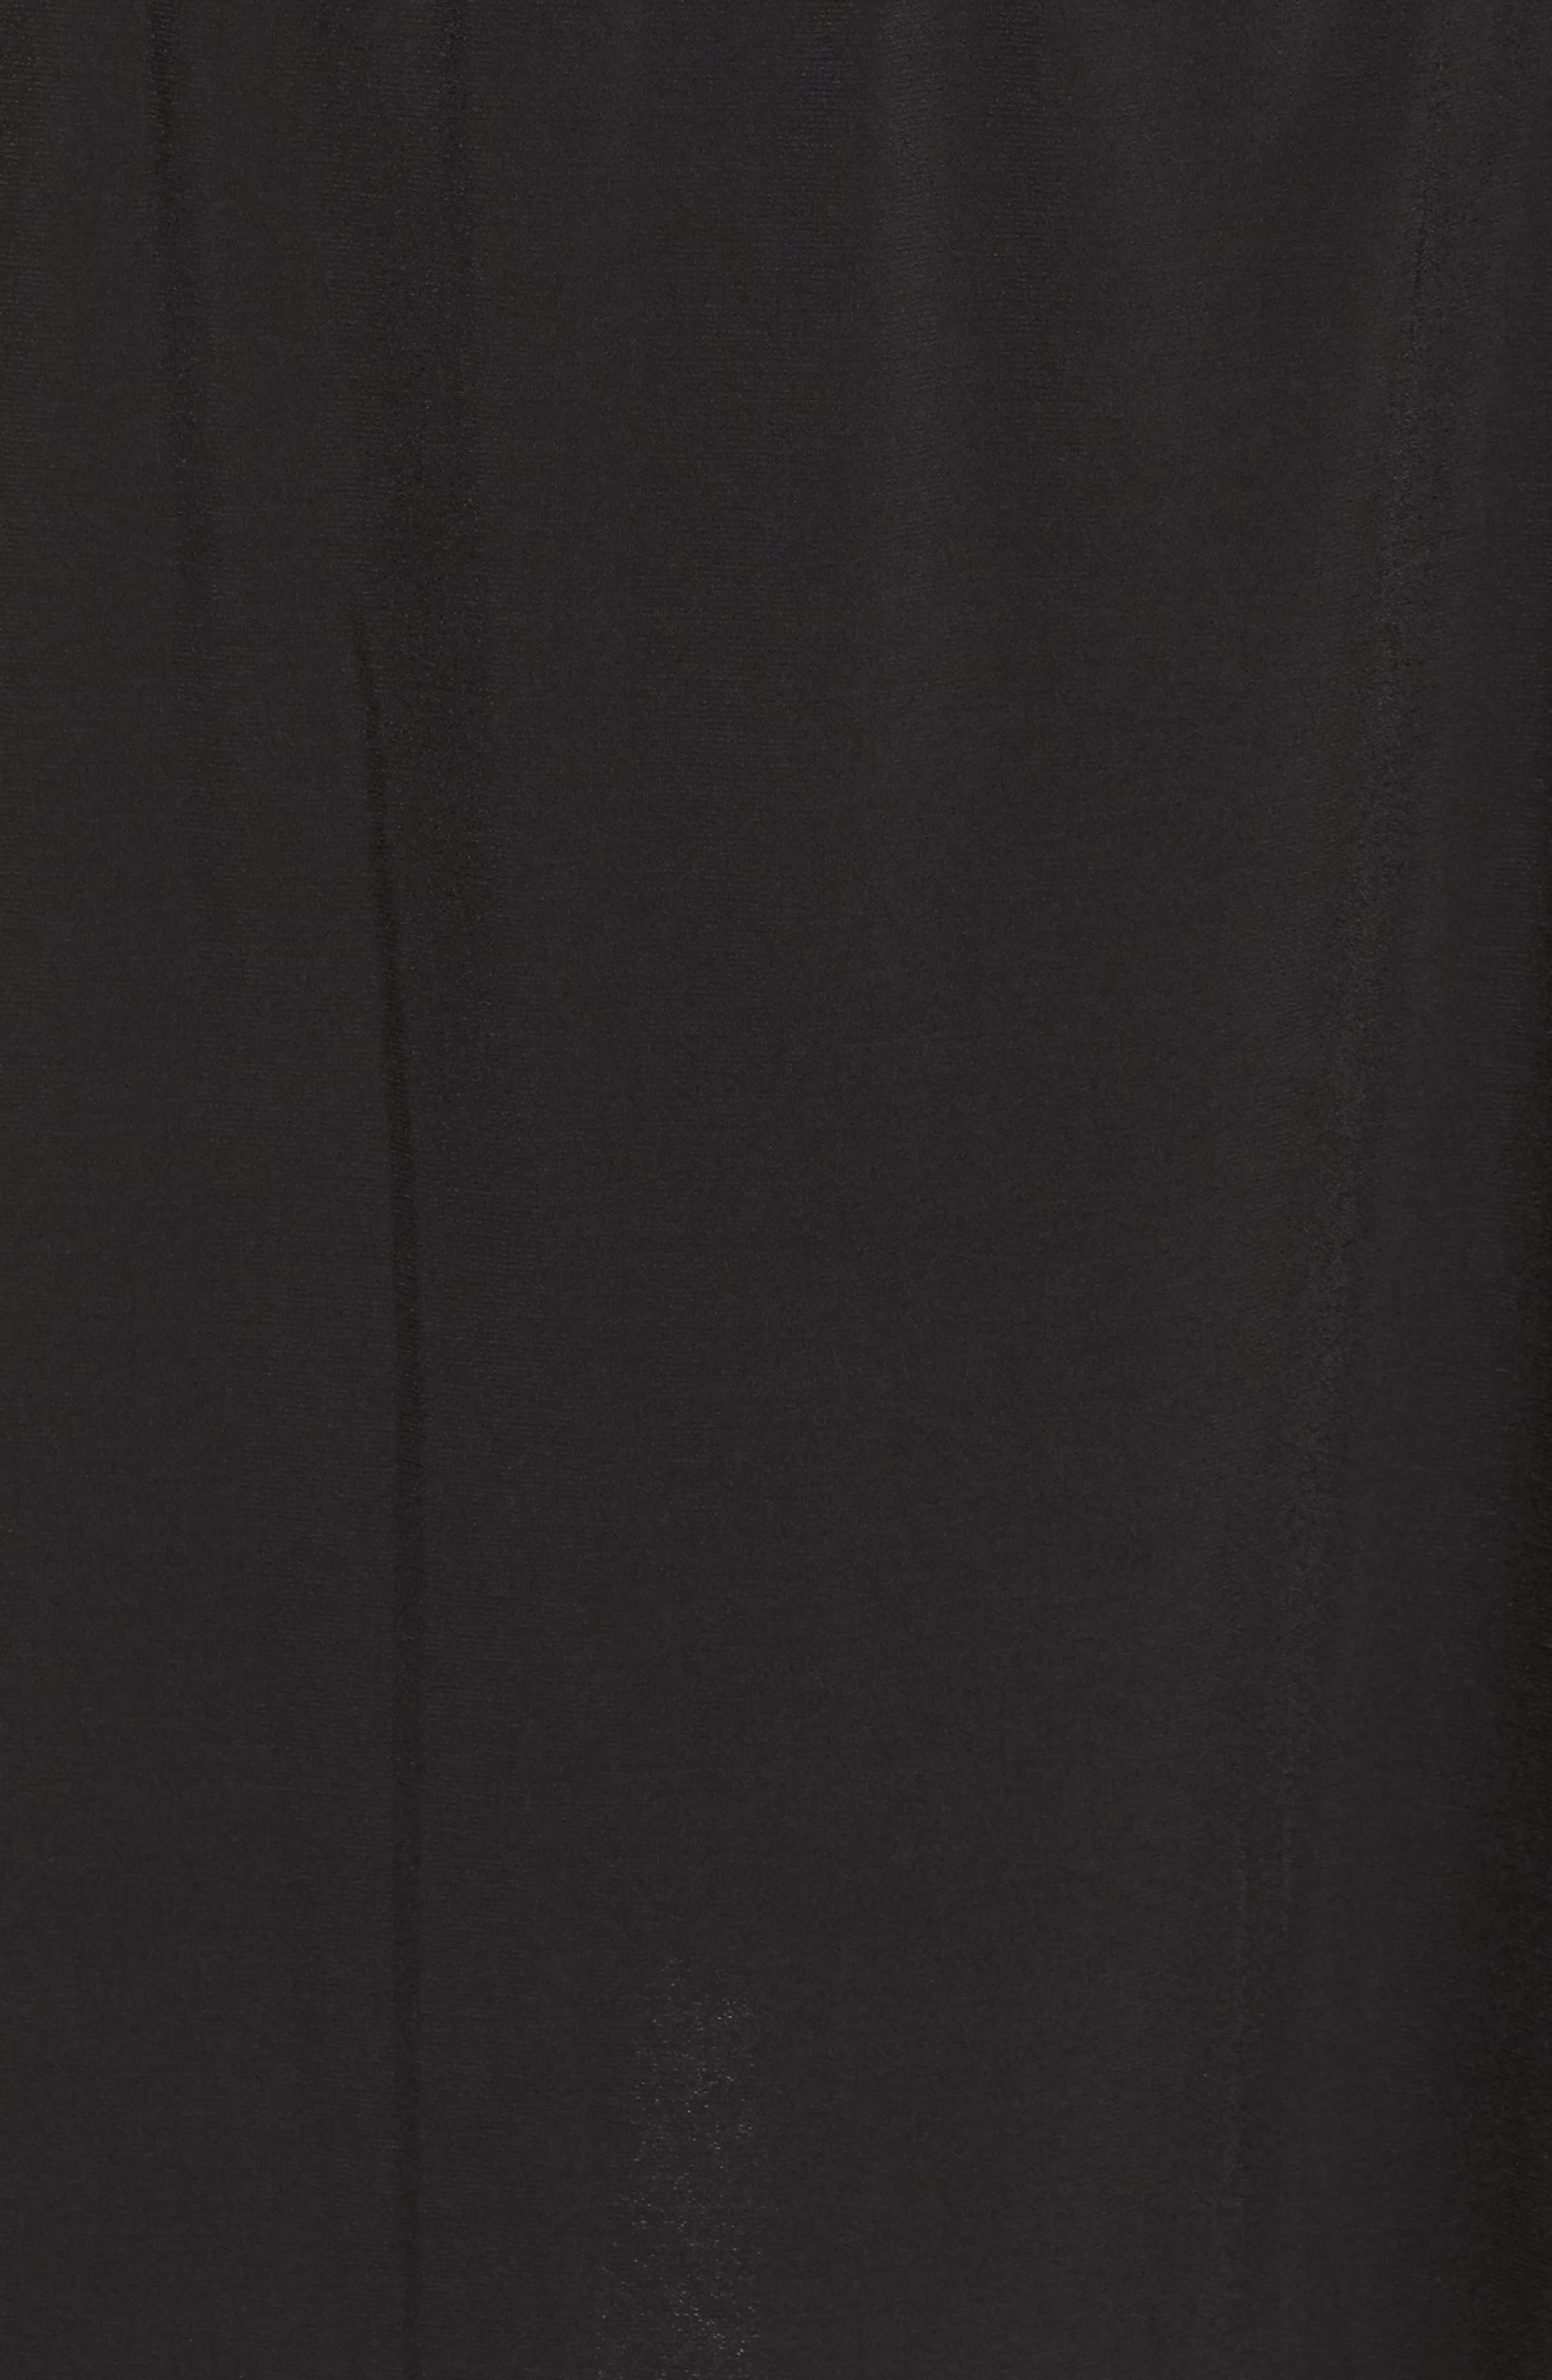 Cold Shoulder A-Line Jersey Dress,                             Alternate thumbnail 5, color,